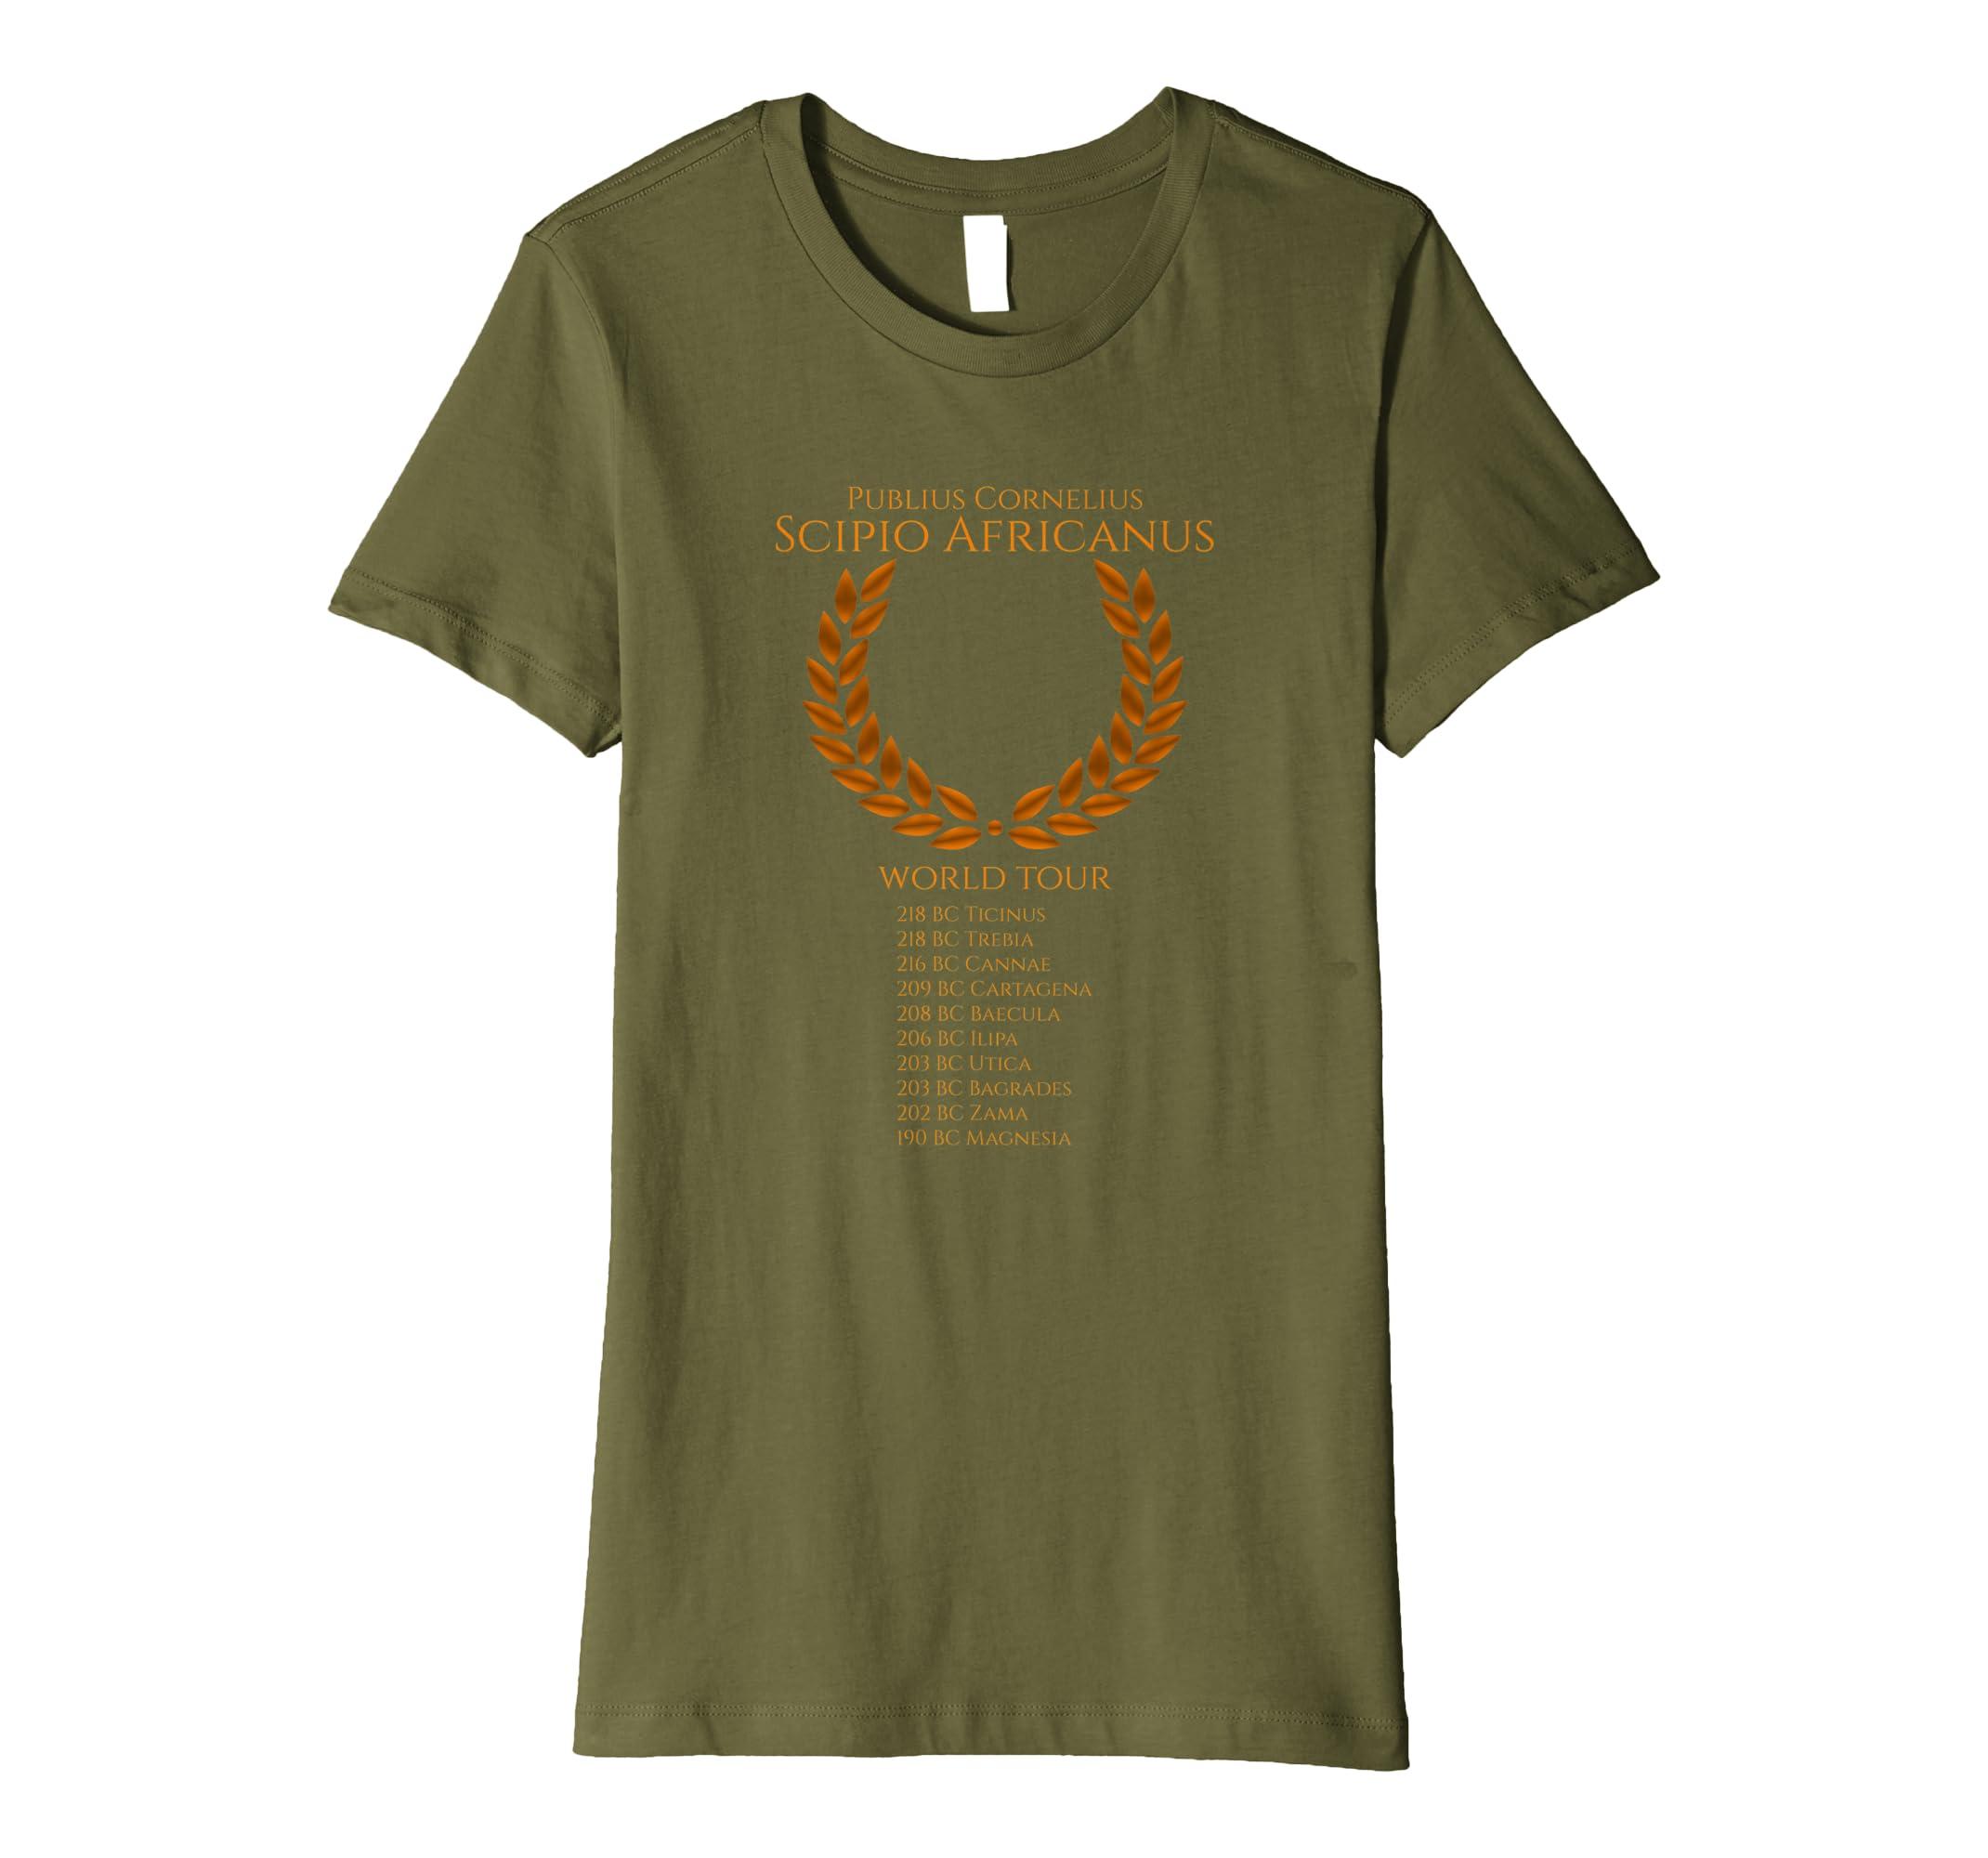 Amazon.com: Scipio Africanus World Tour Ancient Roman Toga Party Shirt: Clothing